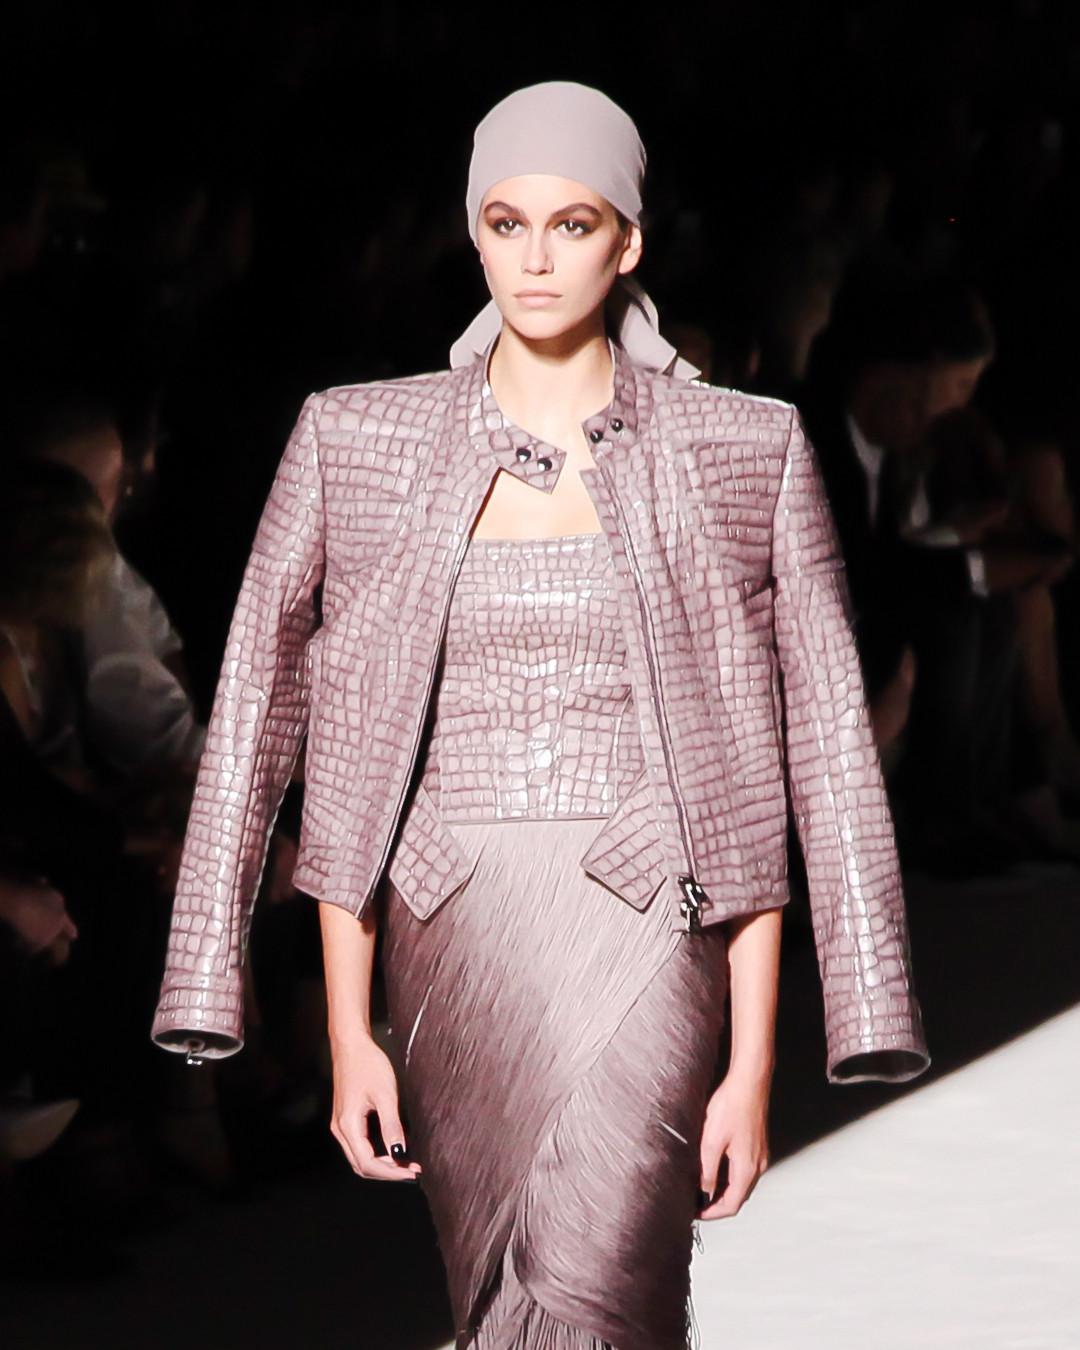 ESC: NYFW Best Looks, Tom Ford, Kaia Gerber